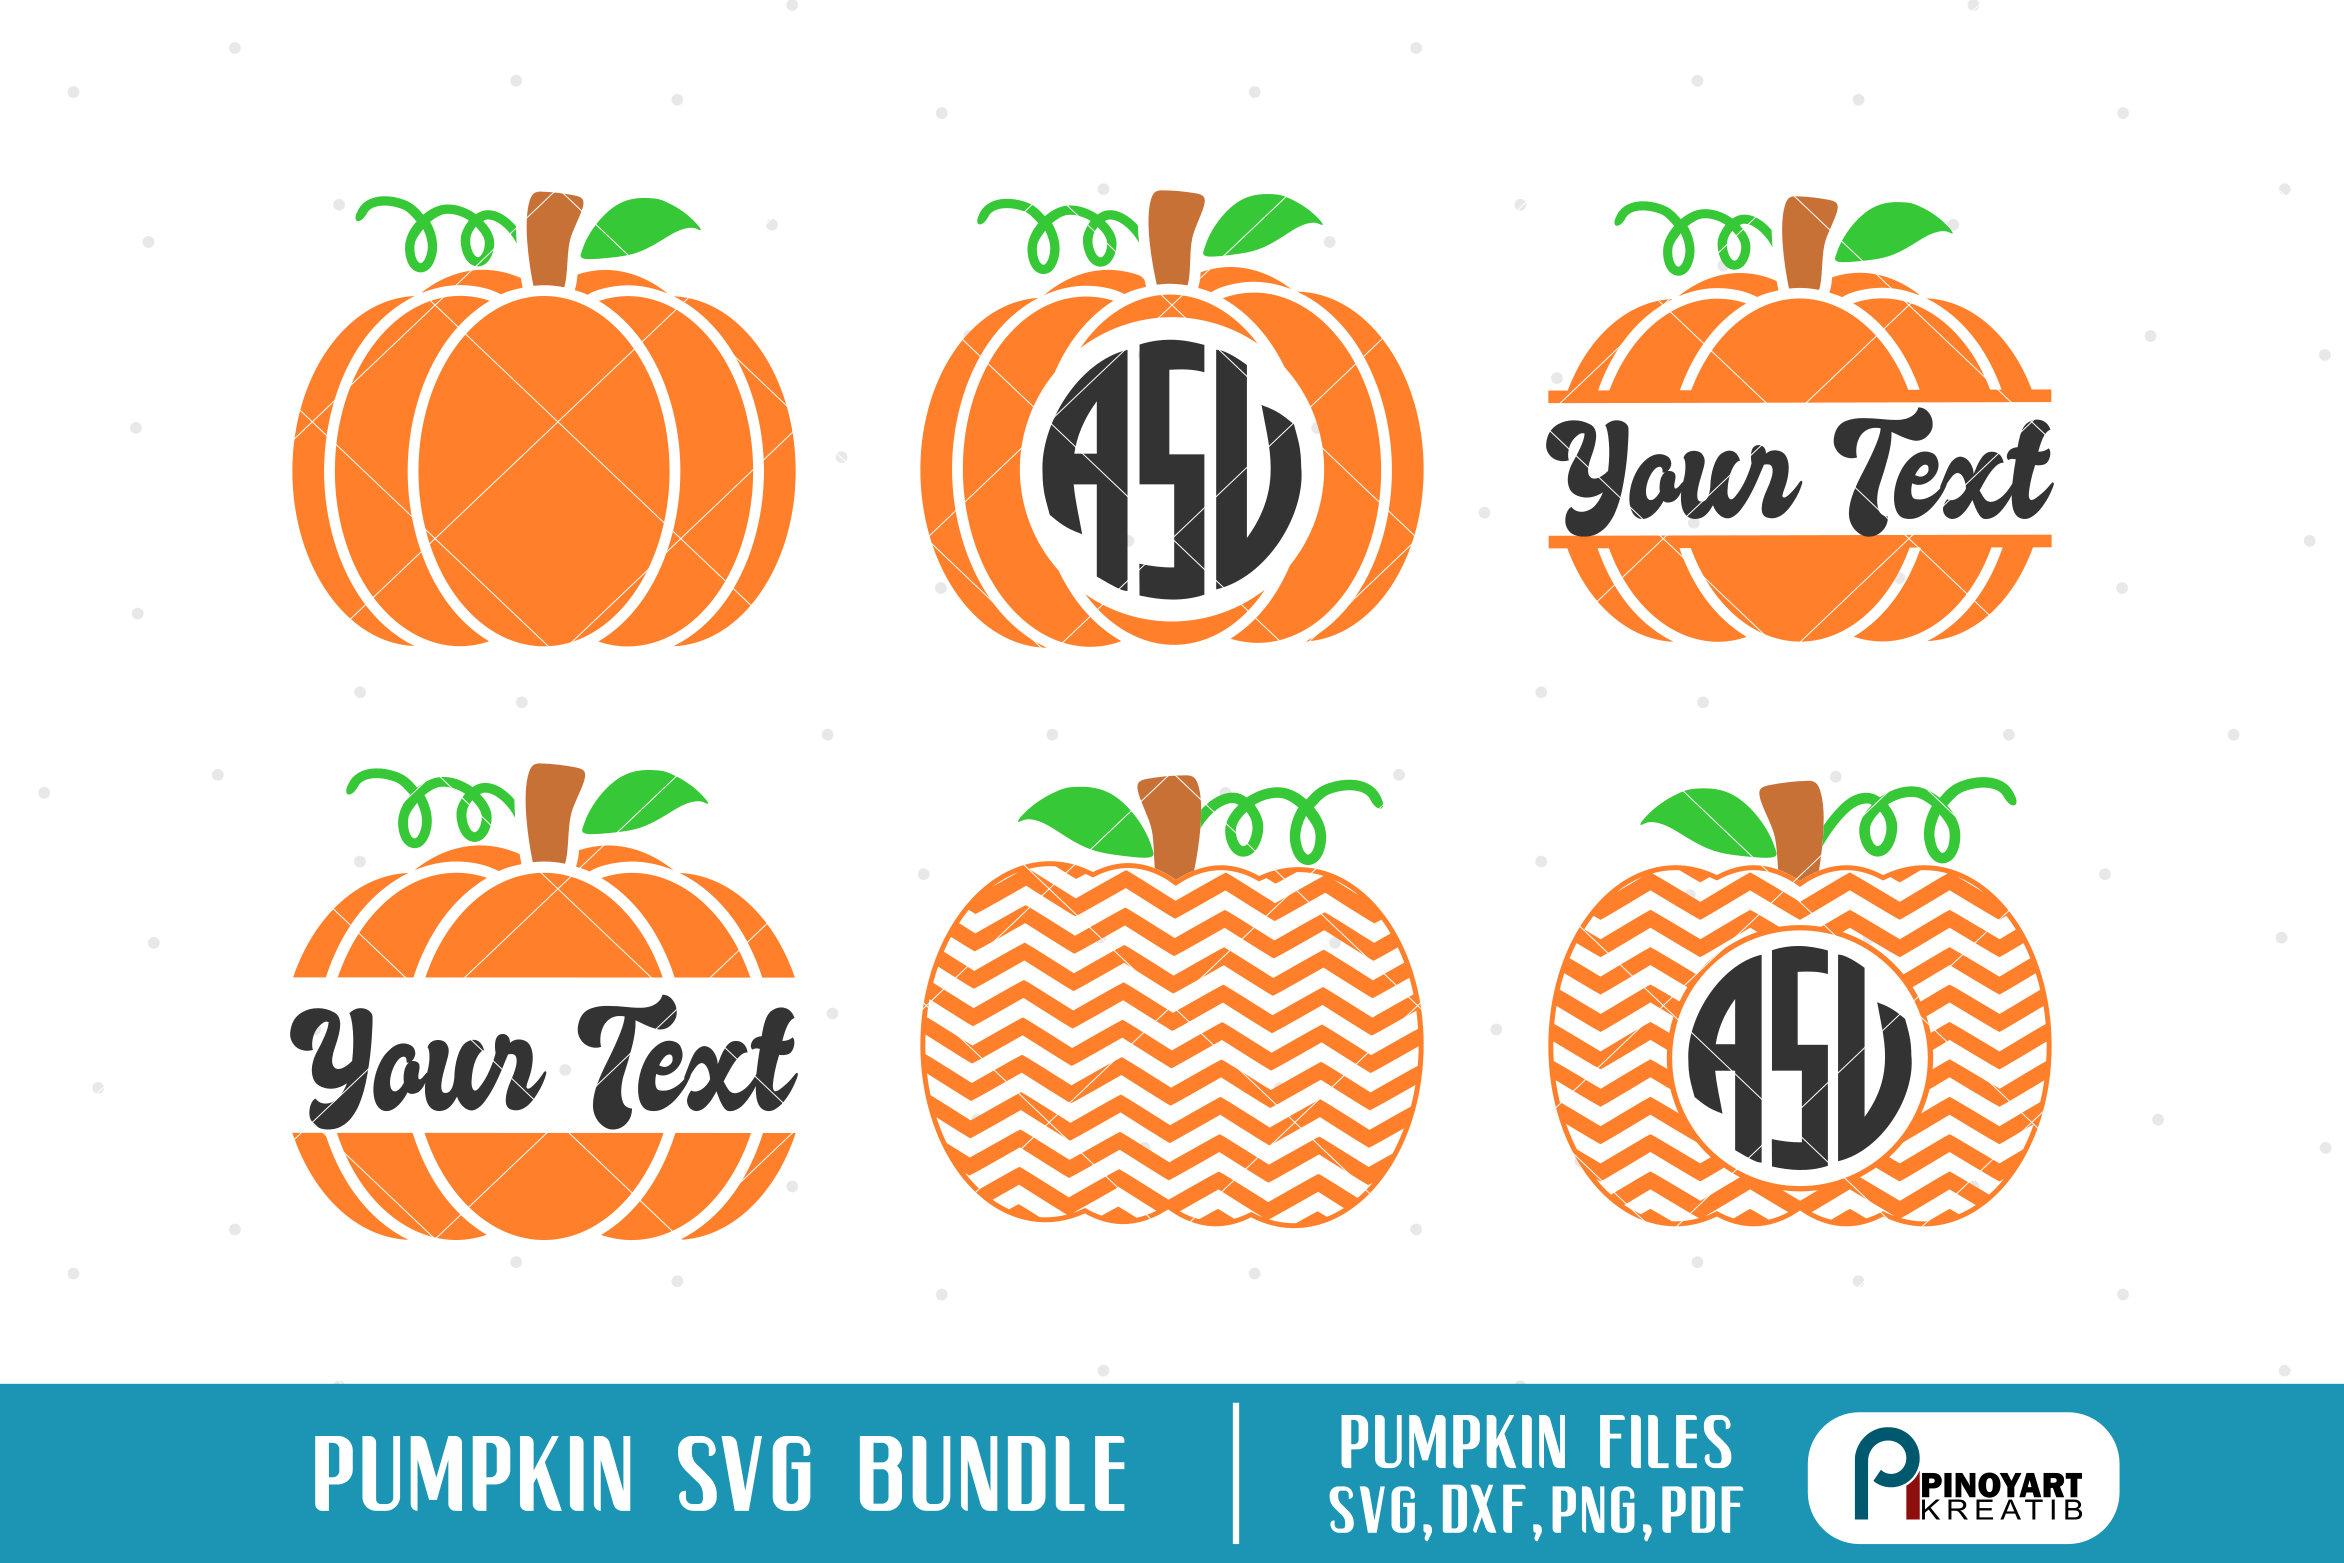 svg pumpkin #617, Download drawings